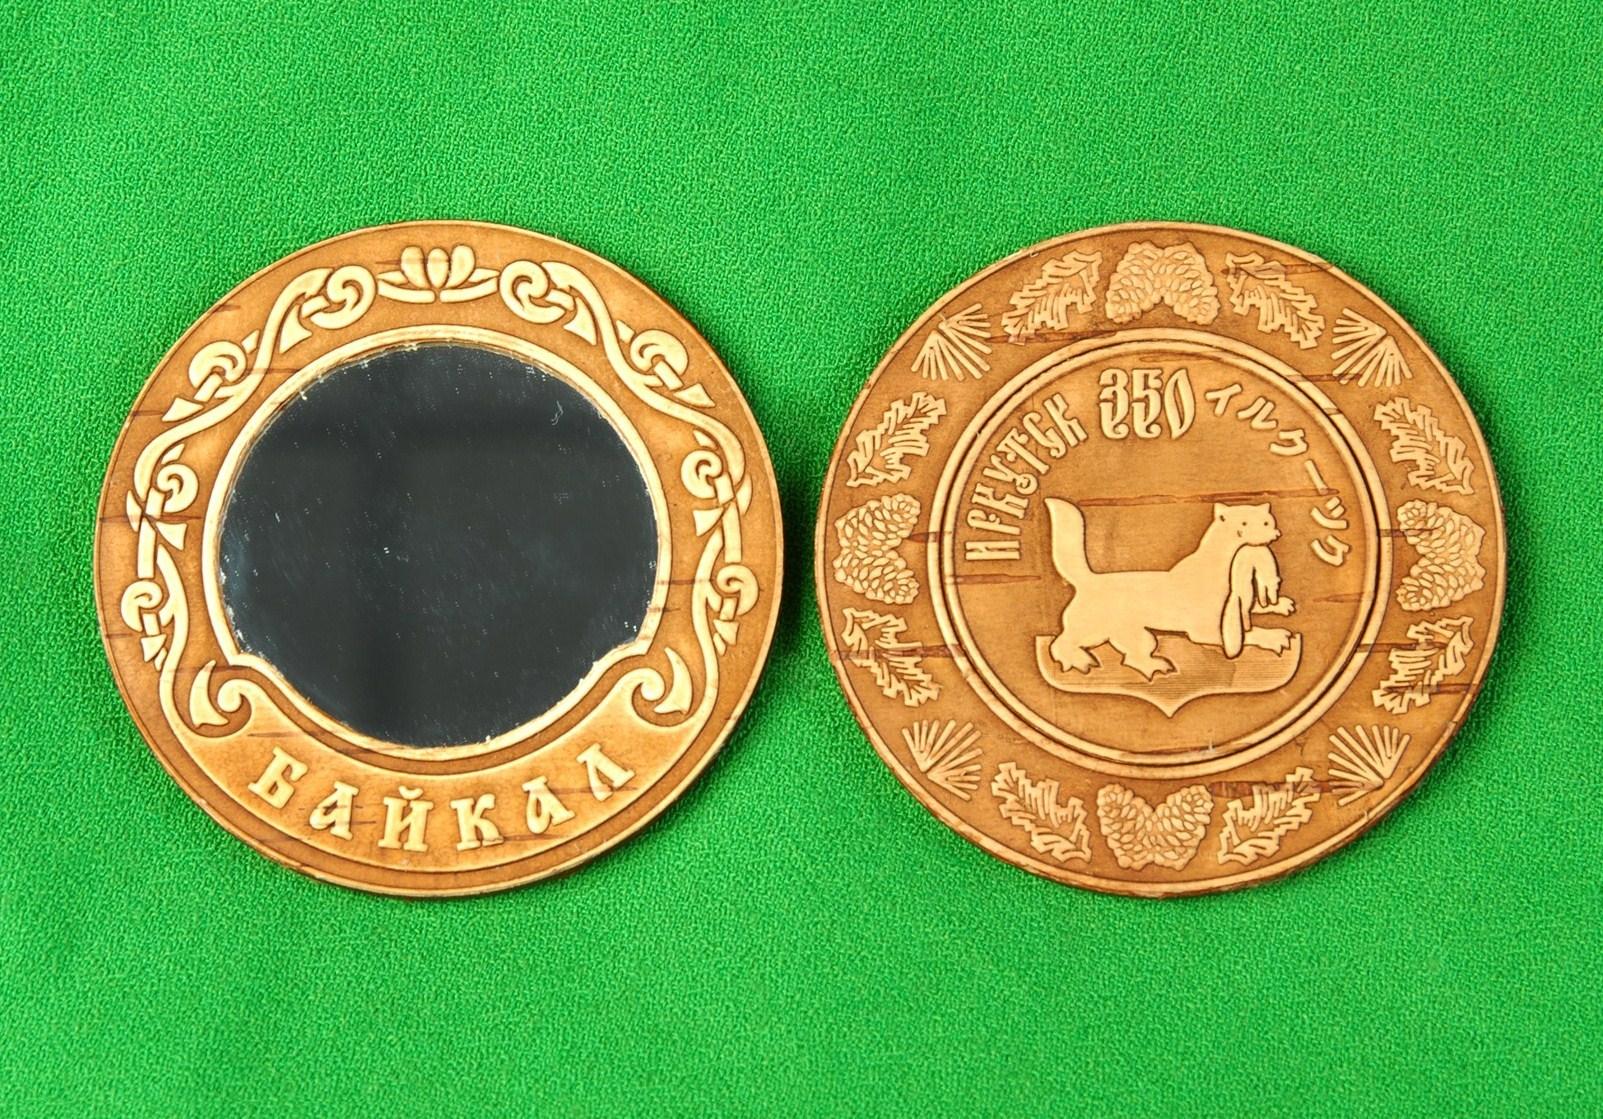 Зеркало Иркутск 350 лет (японский вариант)